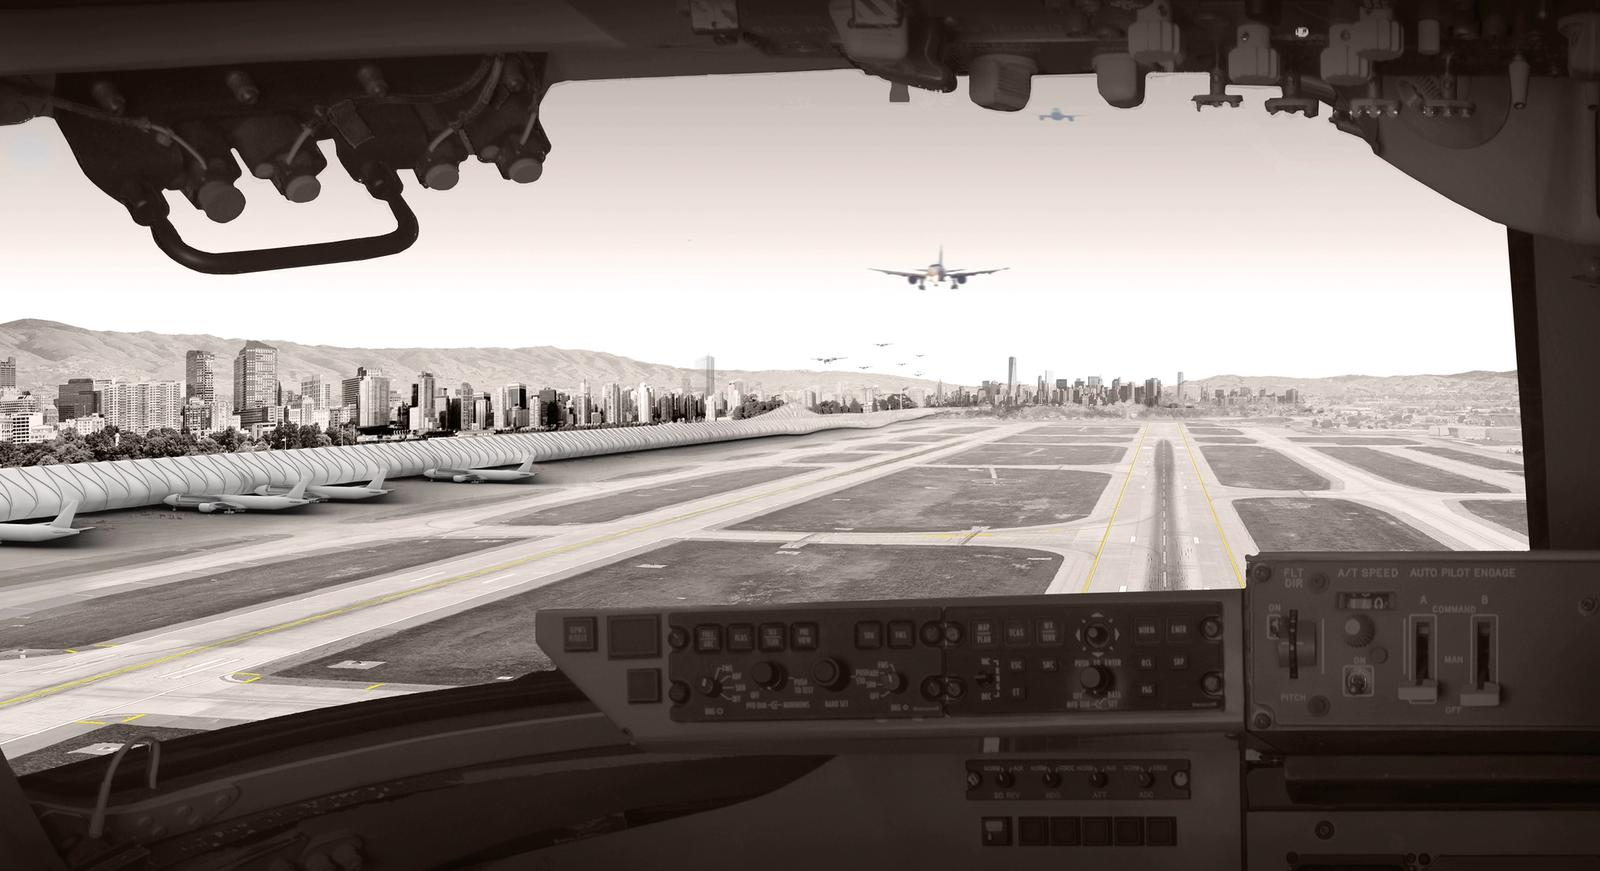 Dana Kaddouh Aviopolis - Aerial View from Cockpit